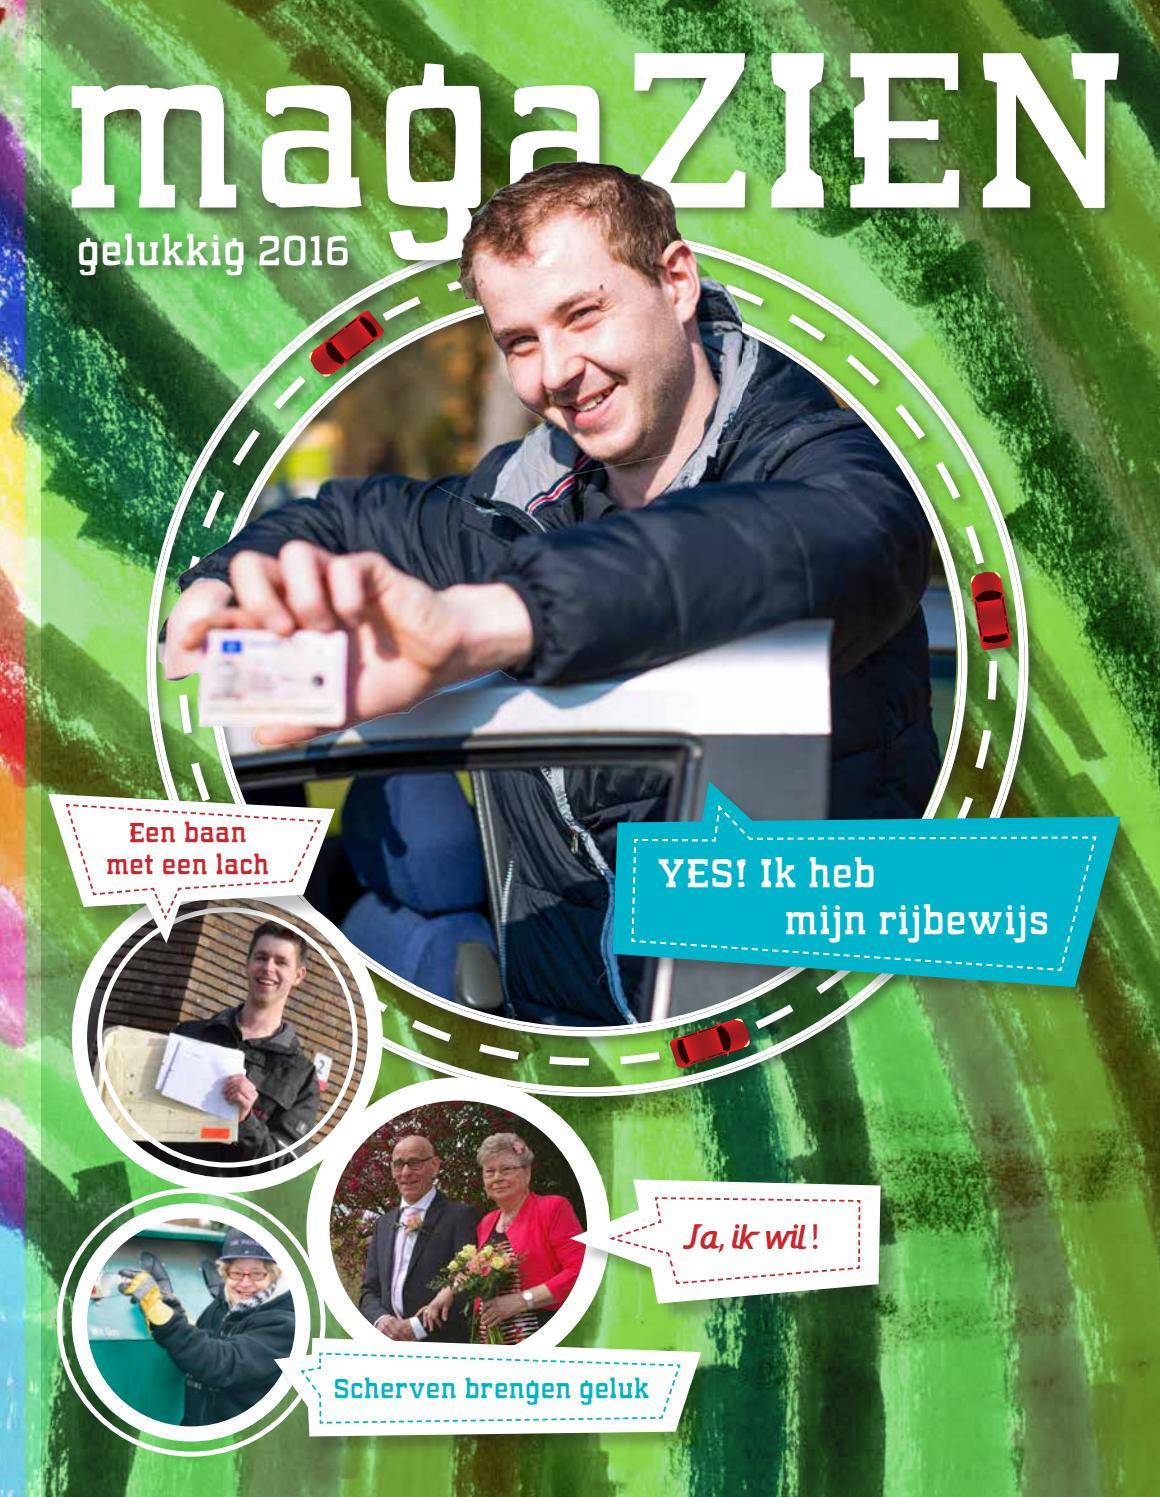 Ergo 2014 3 by ergomagazine   issuu